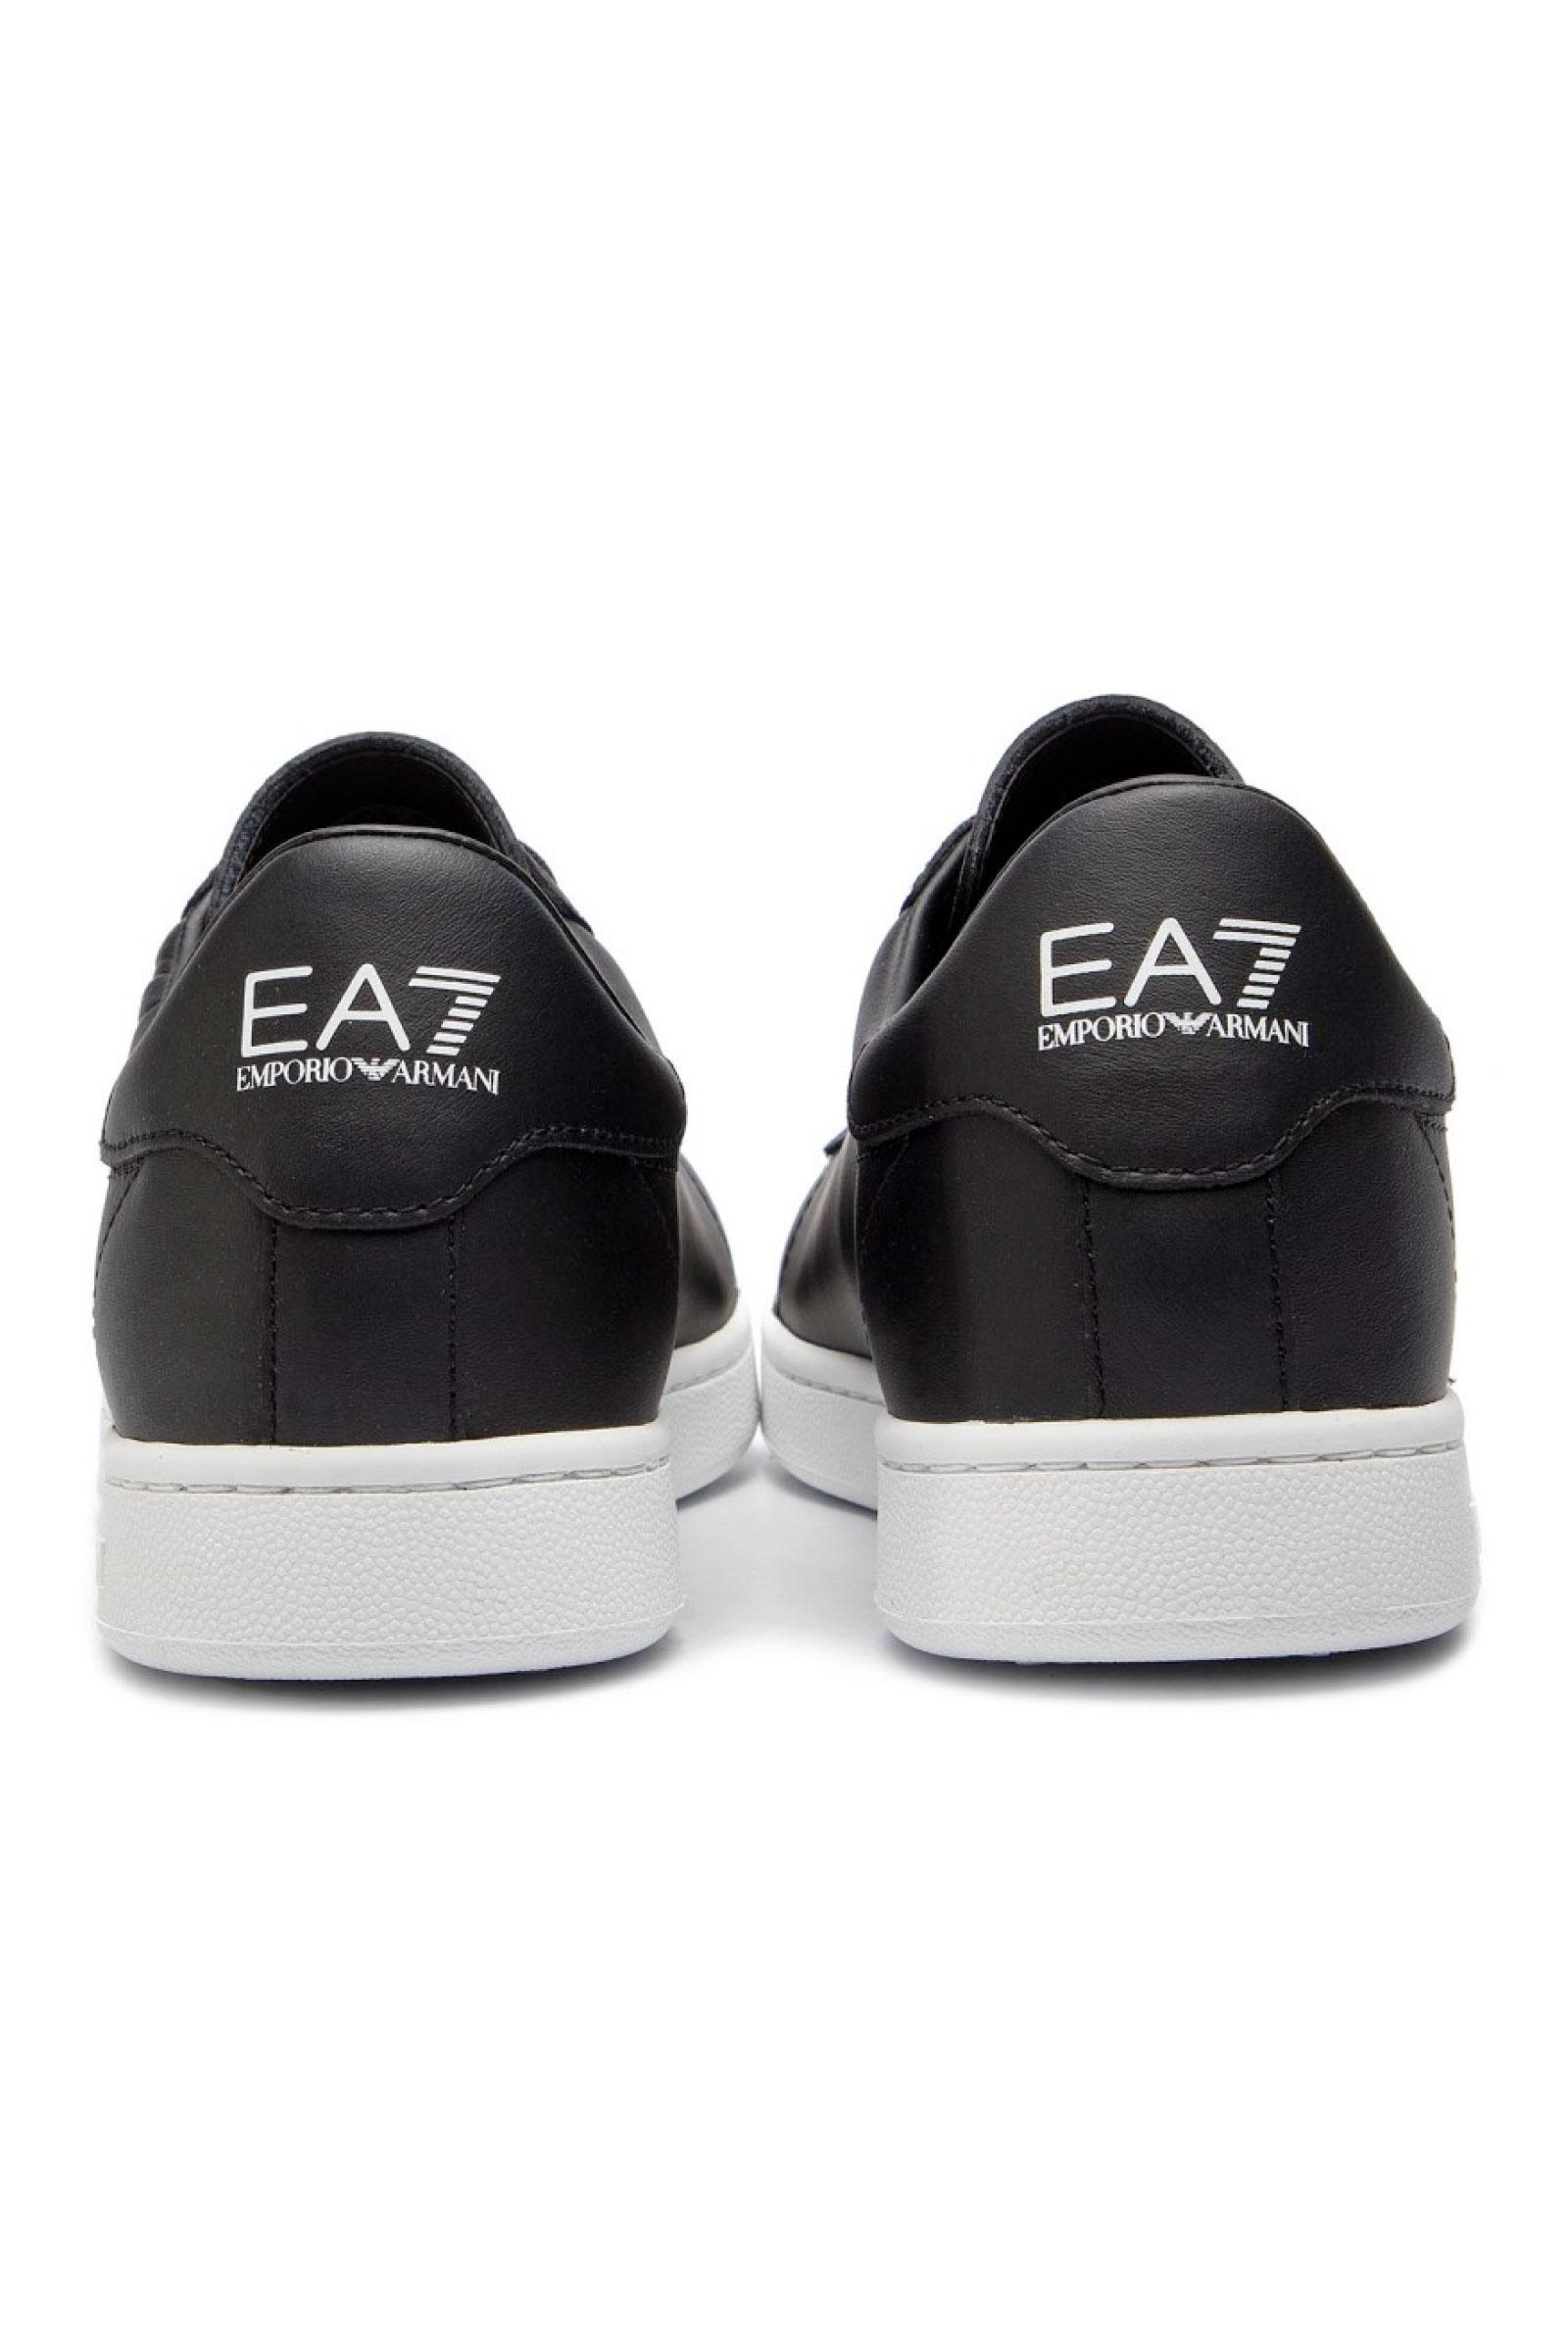 ARMANI EA7 | Shoes | X8X001 XCC5100002